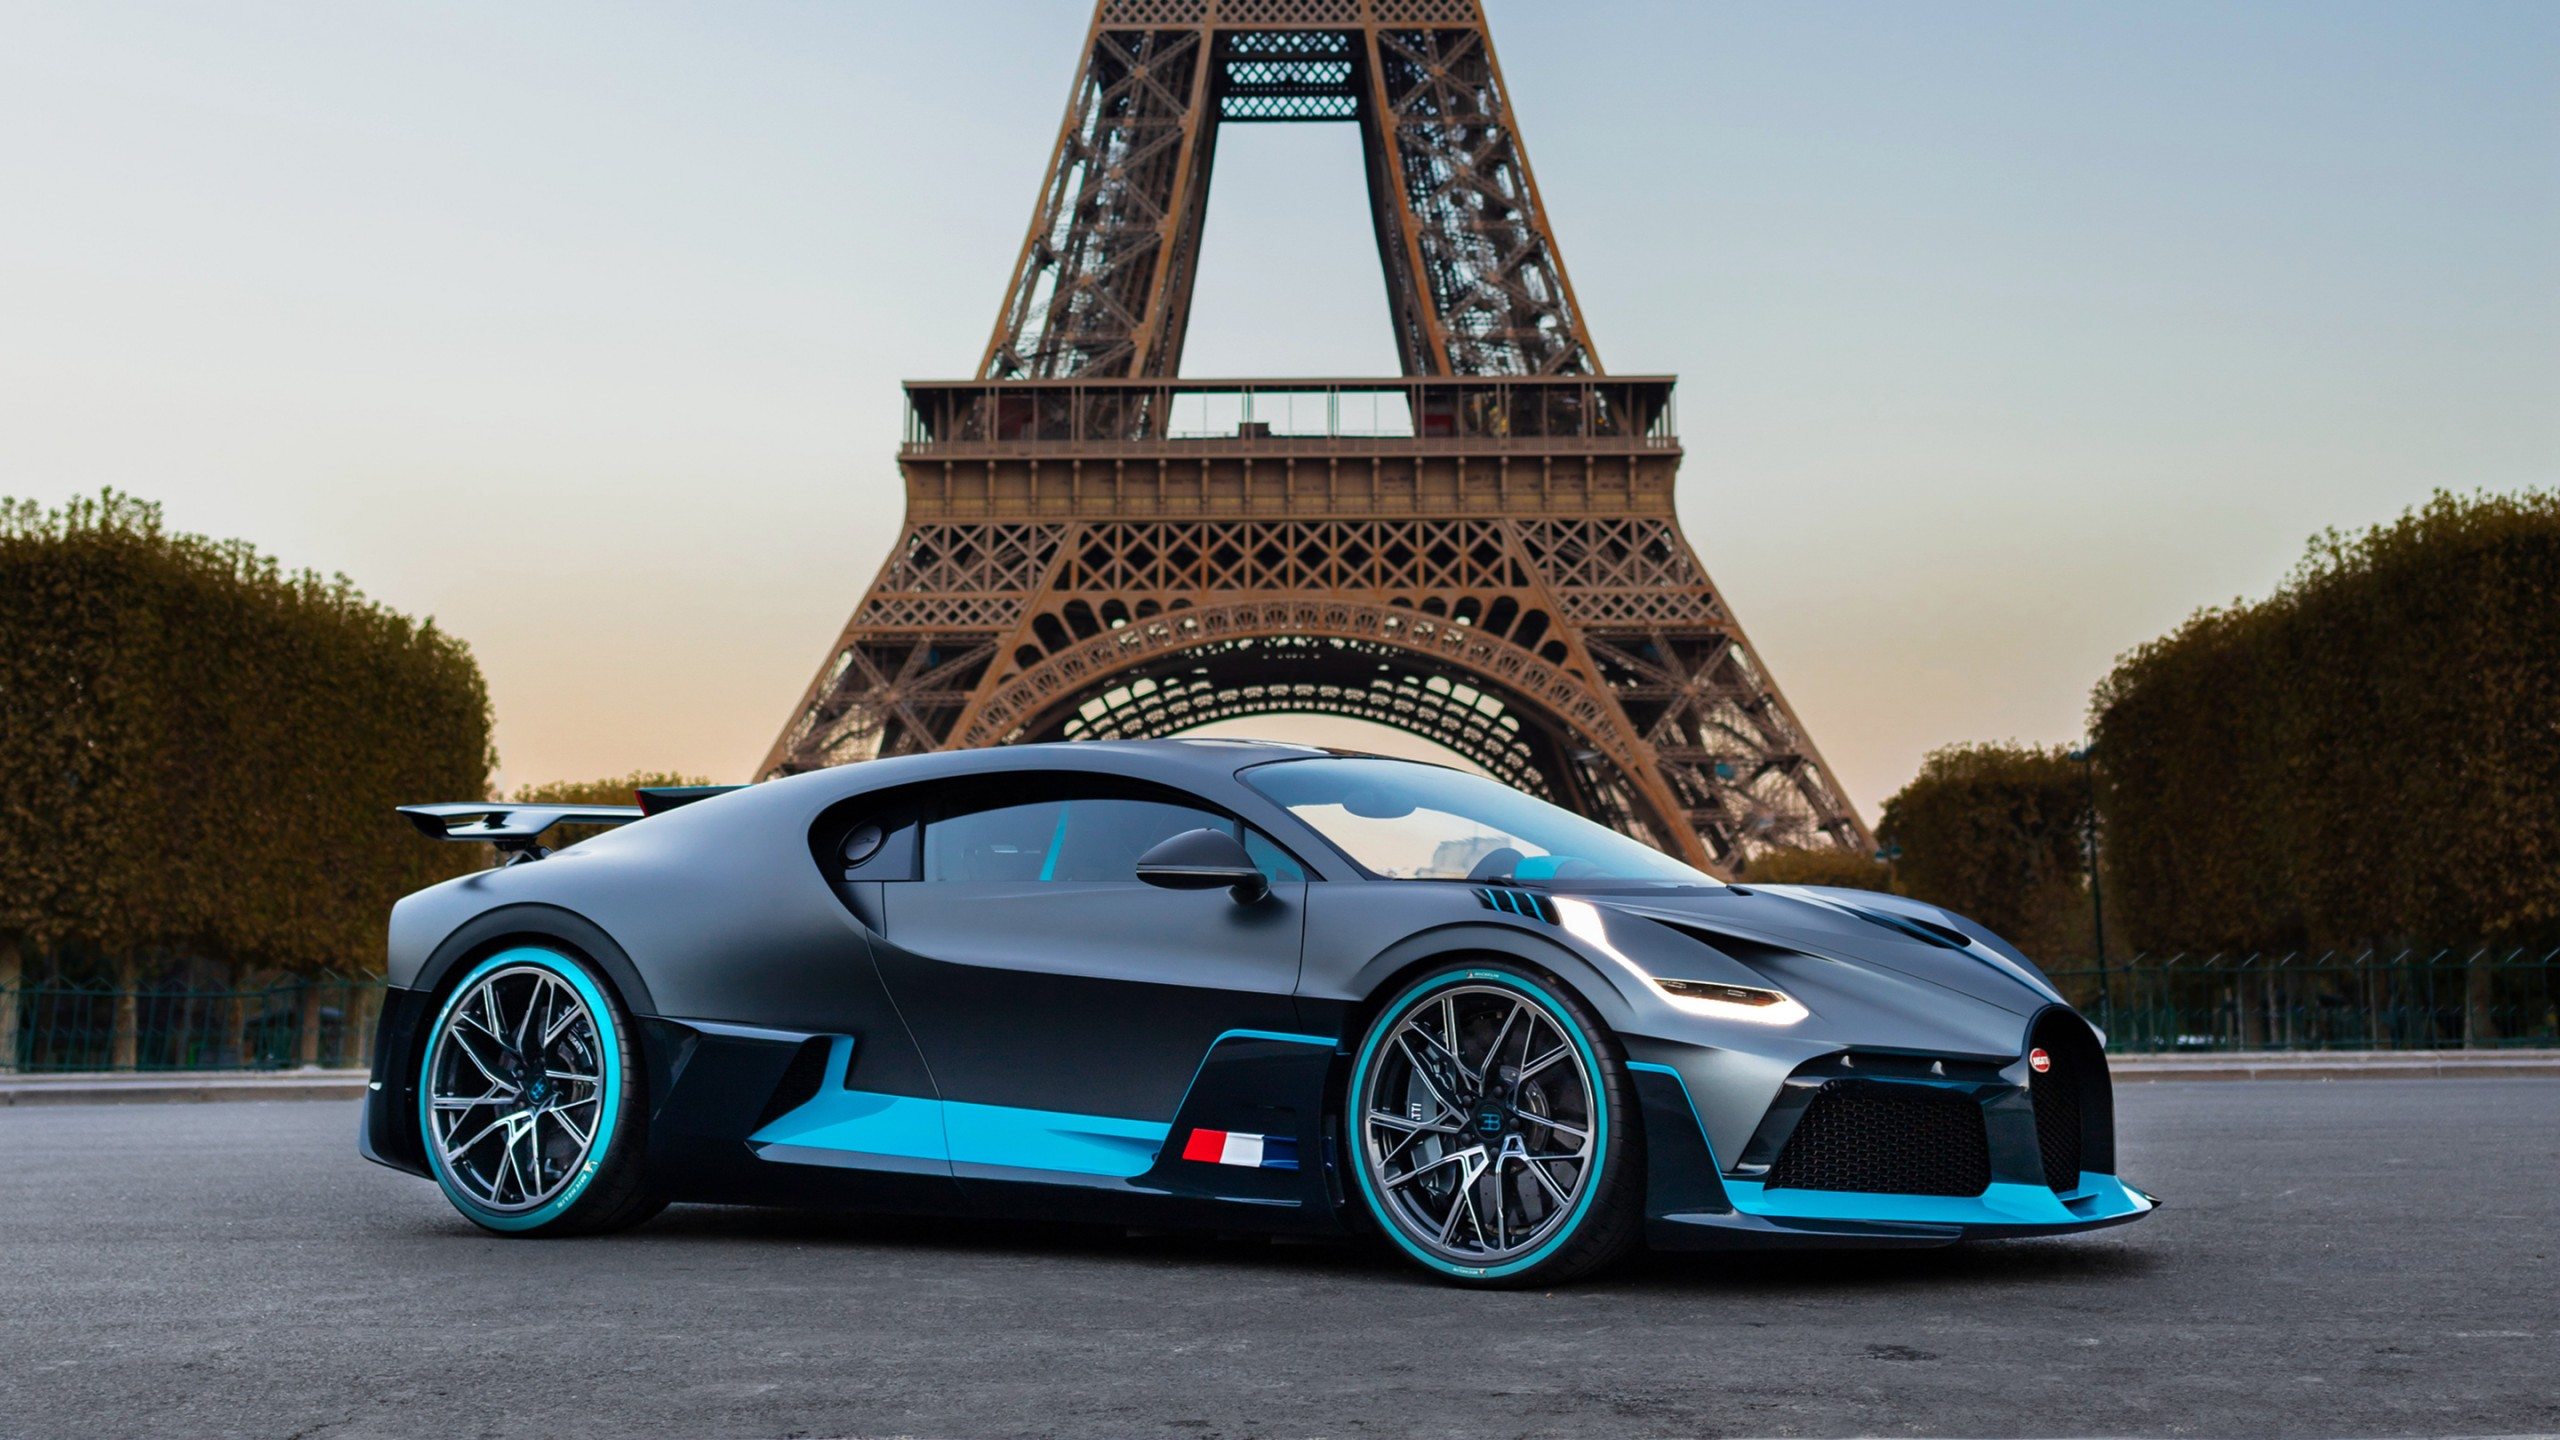 Bugatti Divo In Paris Wallpaper HD Car Wallpapers ID